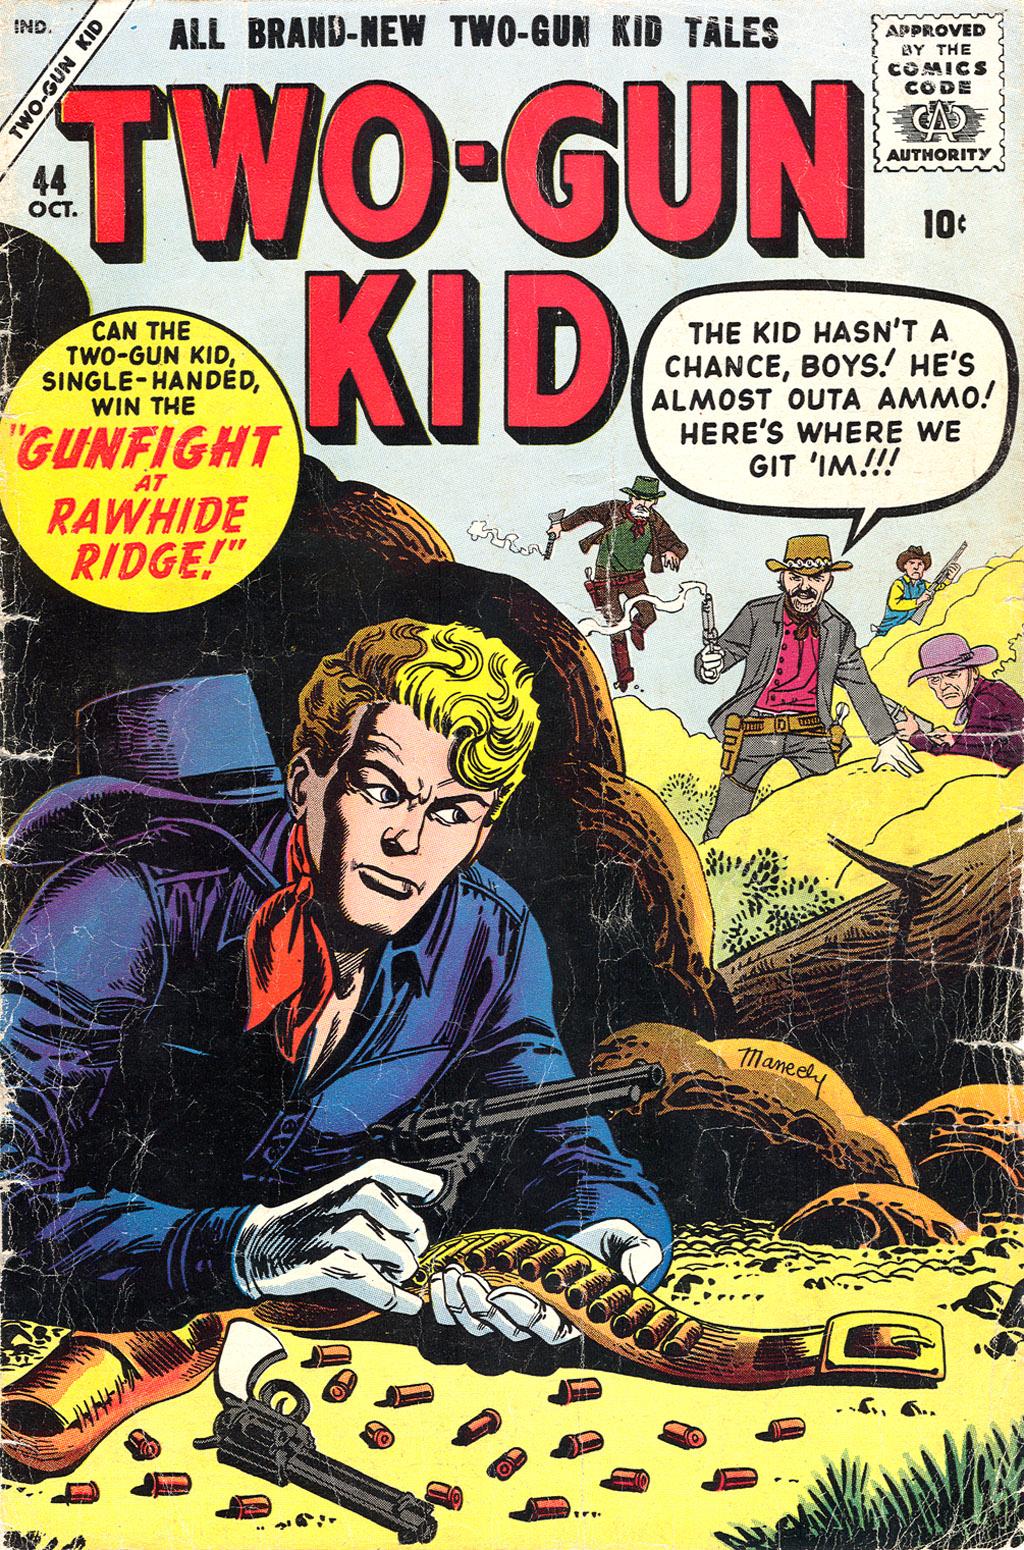 Read online Two-Gun Kid comic -  Issue #44 - 1